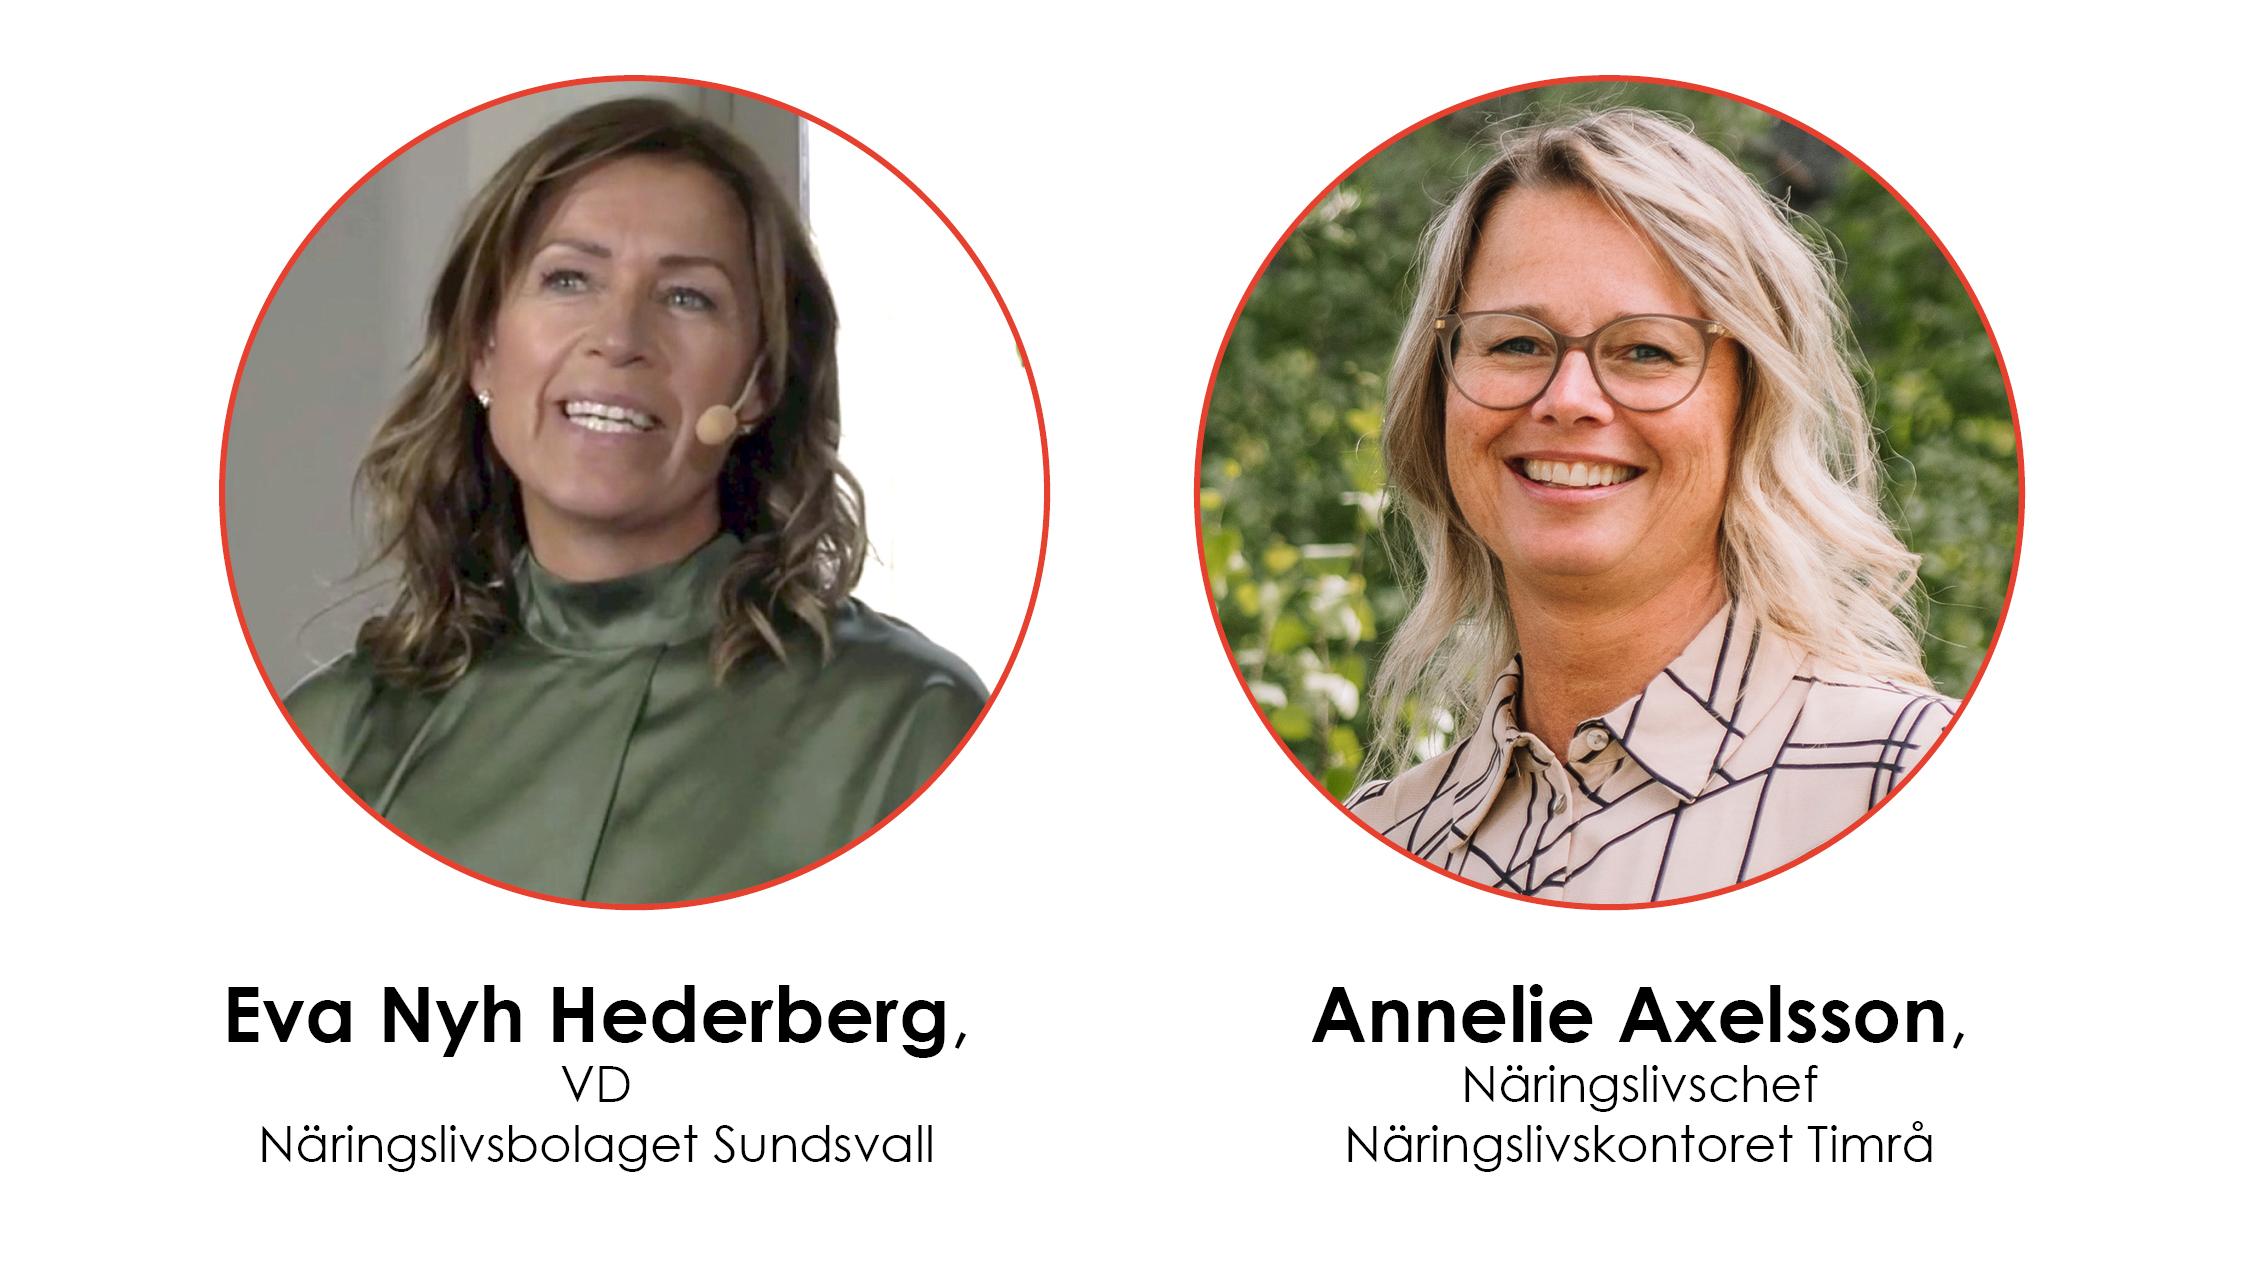 Eva Nyh Hederberg och Annelie Axelsson